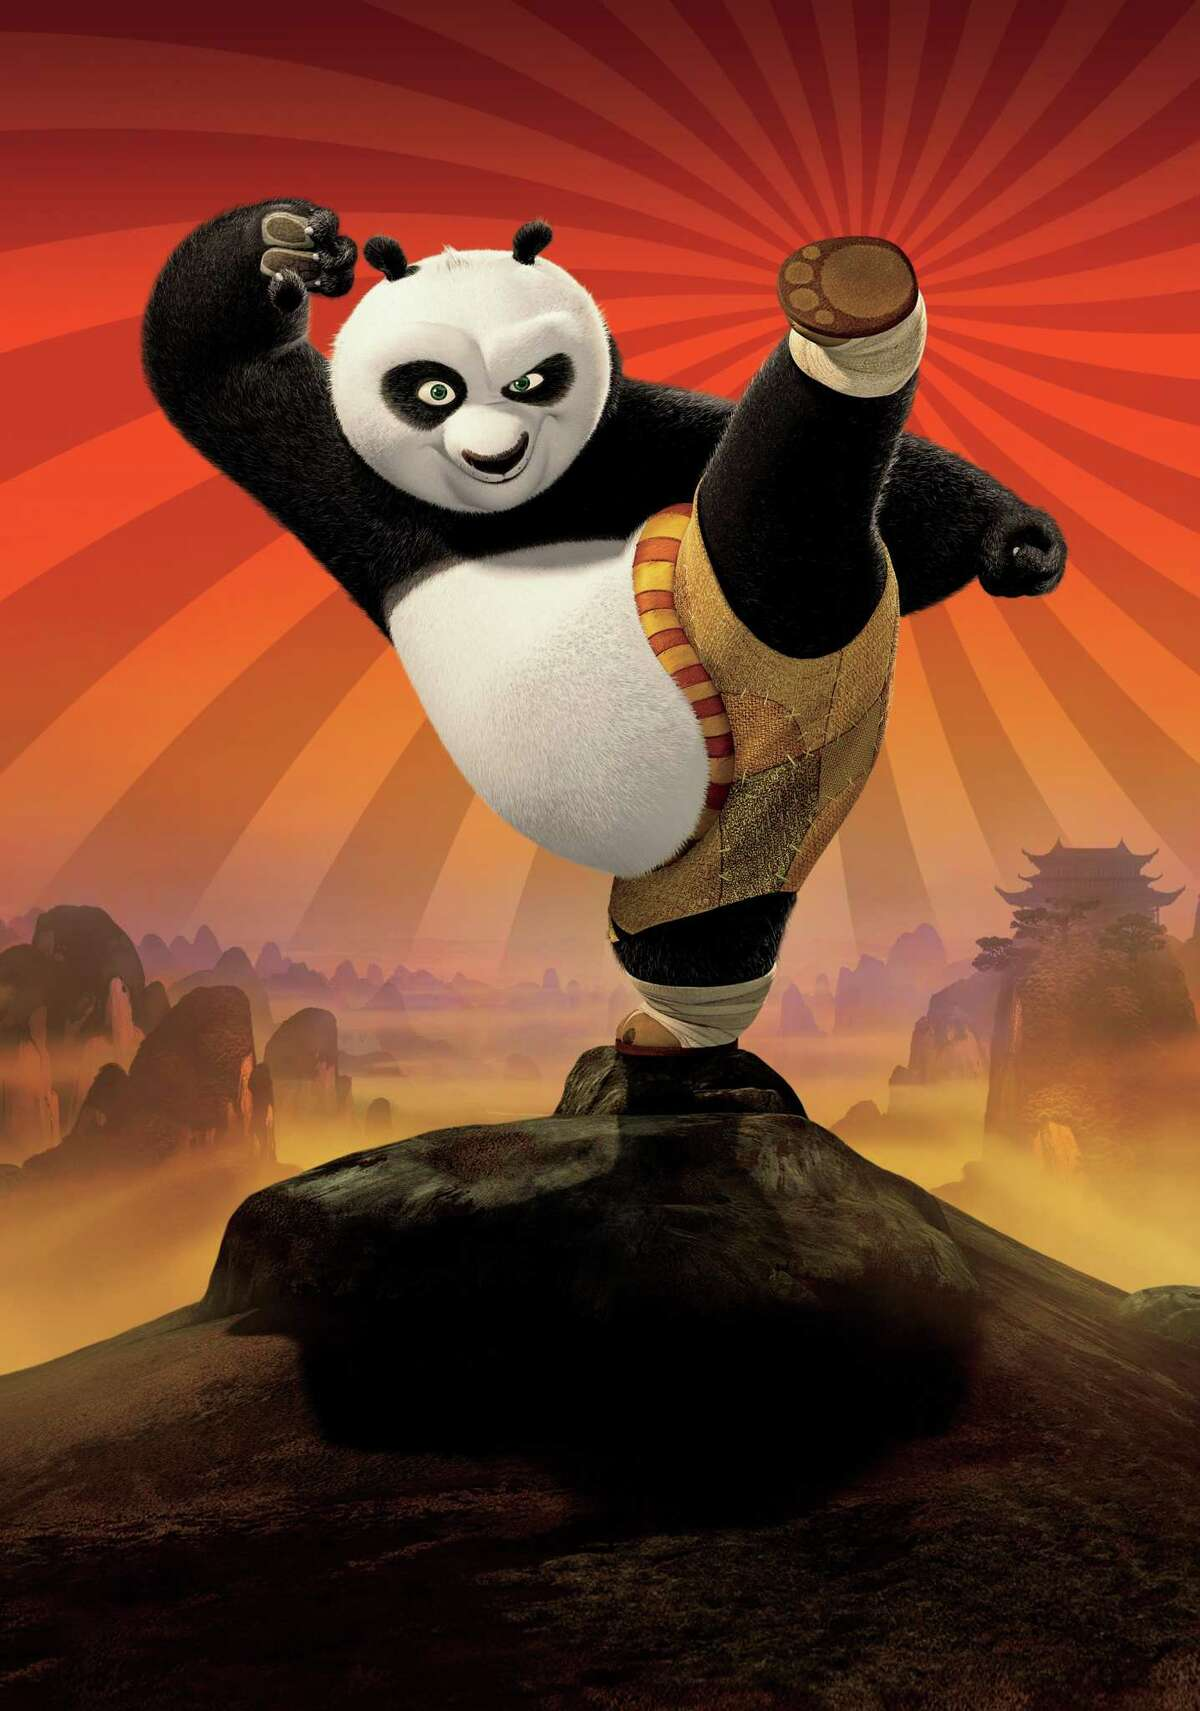 Kung Fu Panda (2008) | Kung Fu Panda 2 (2011) Leaving Netflix September 30